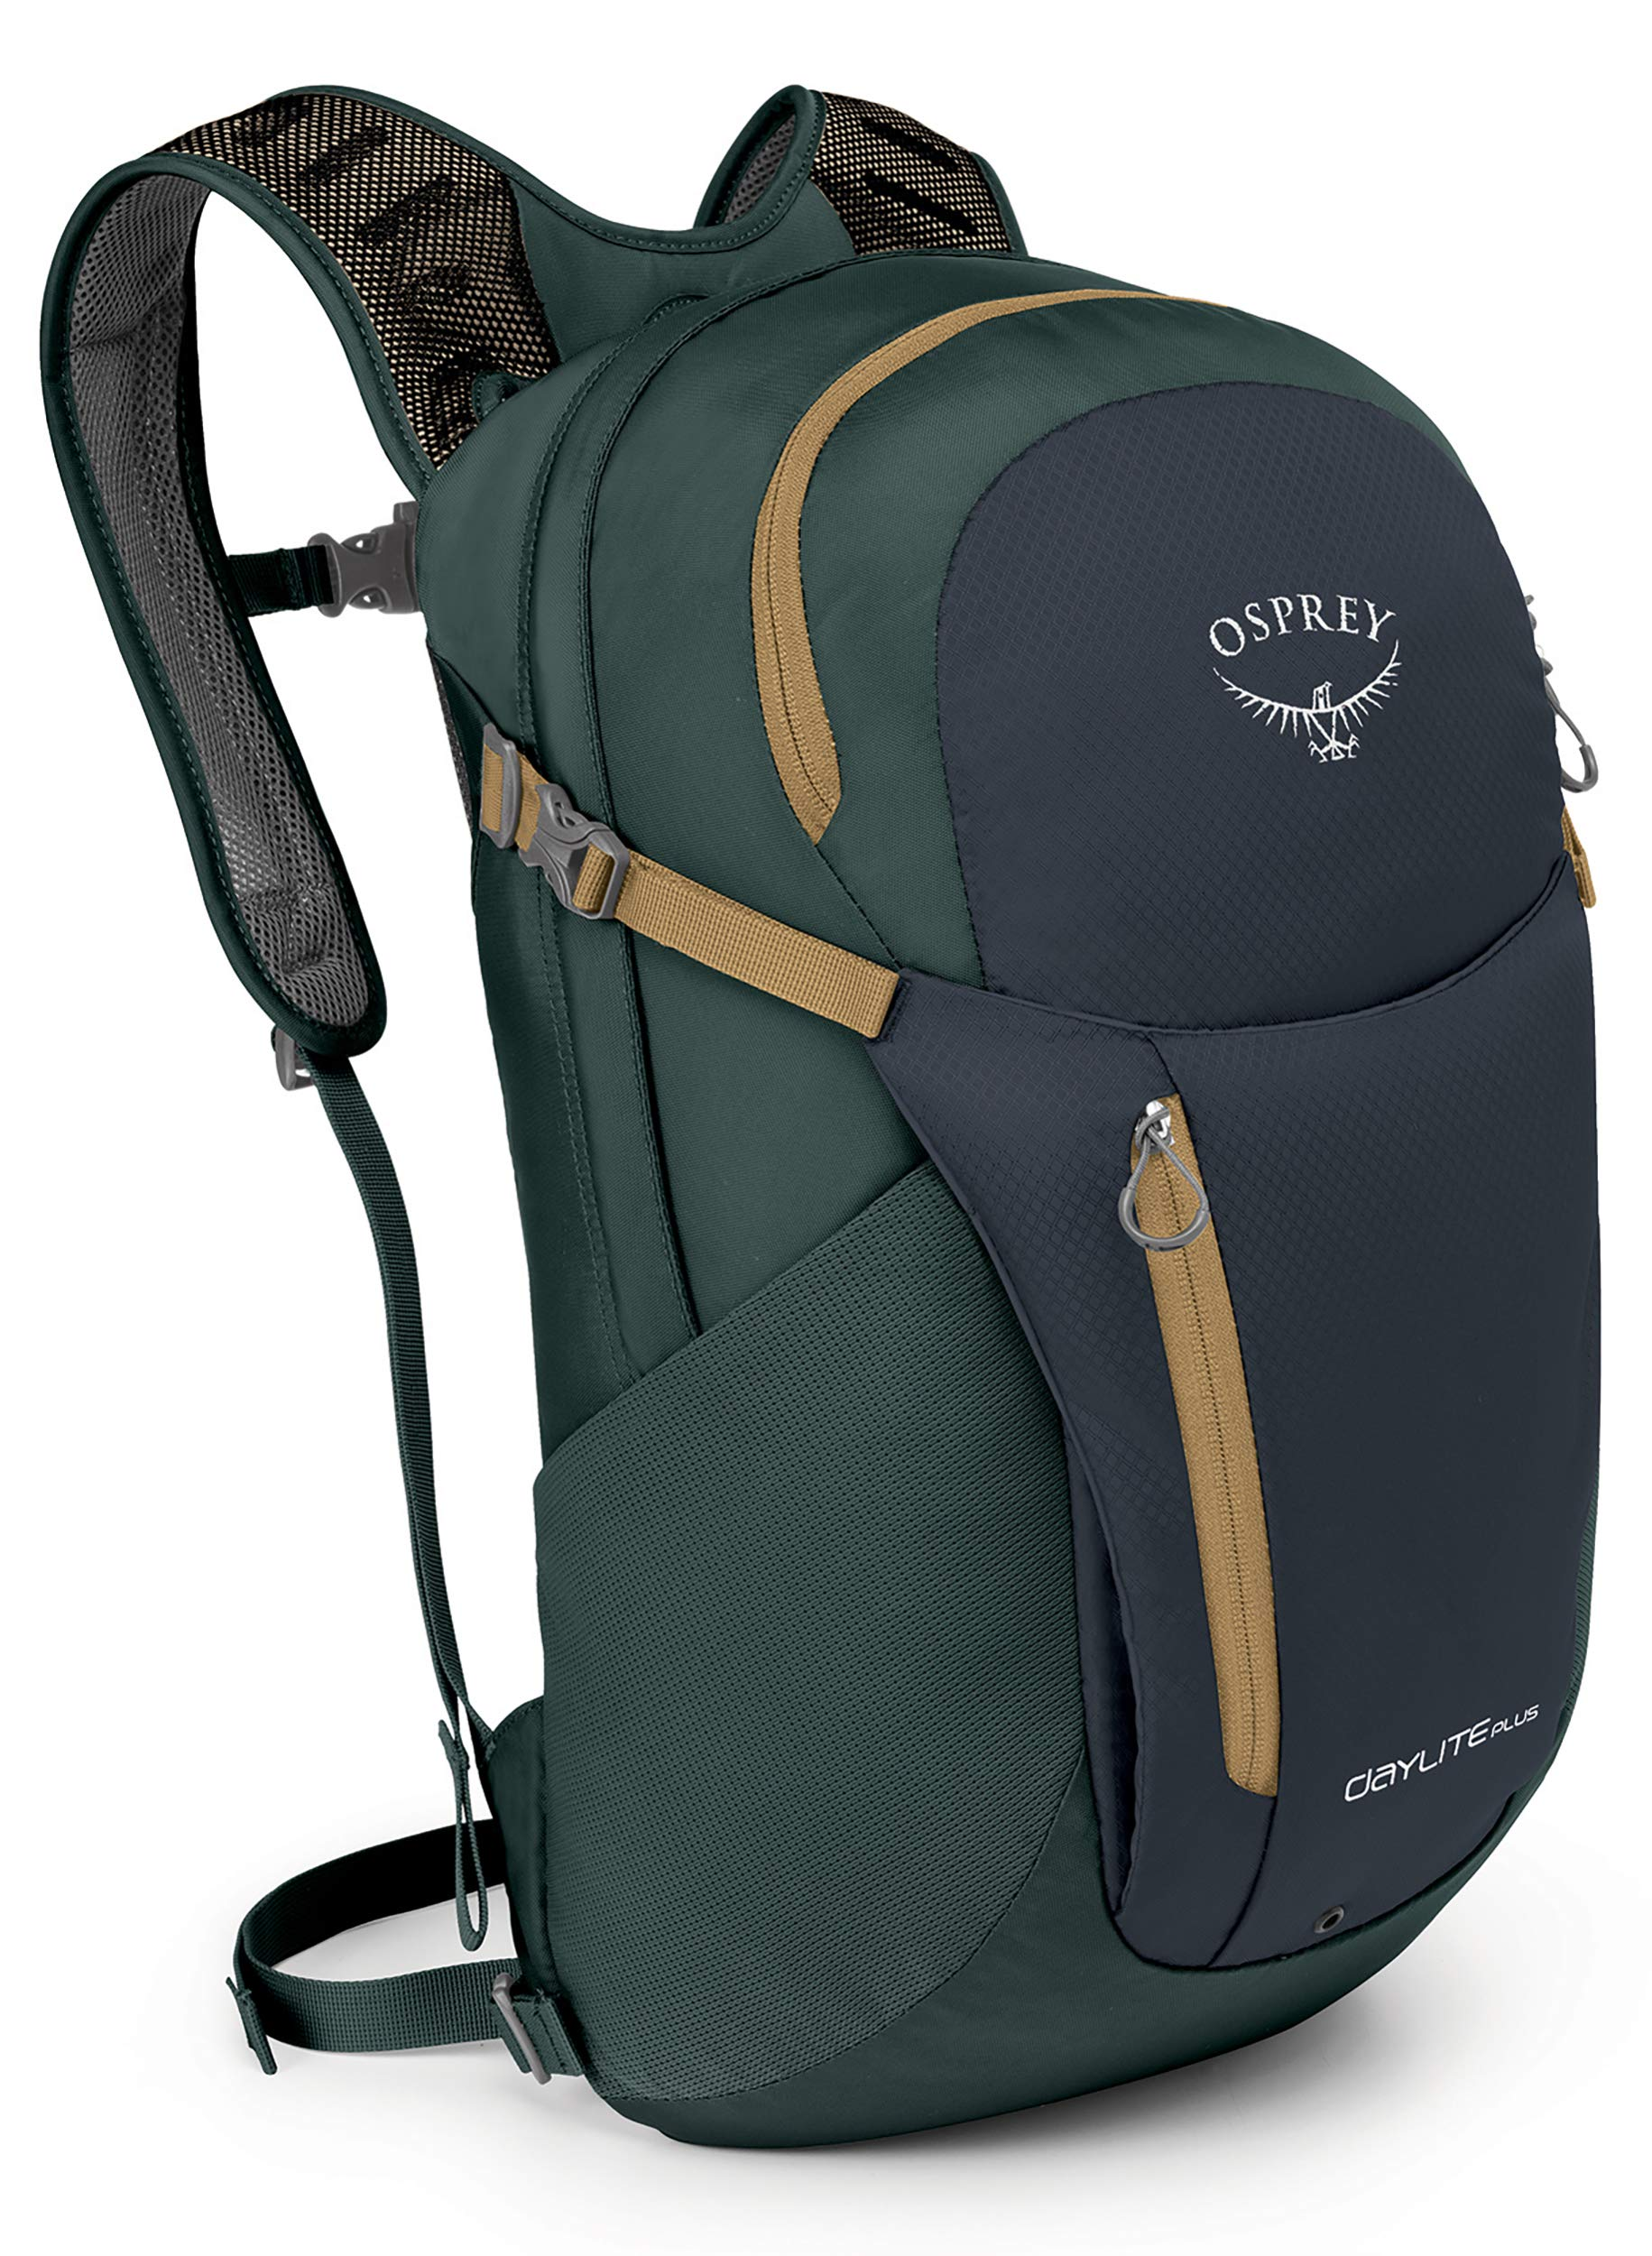 Osprey Packs Daylite Plus Daypack by Osprey